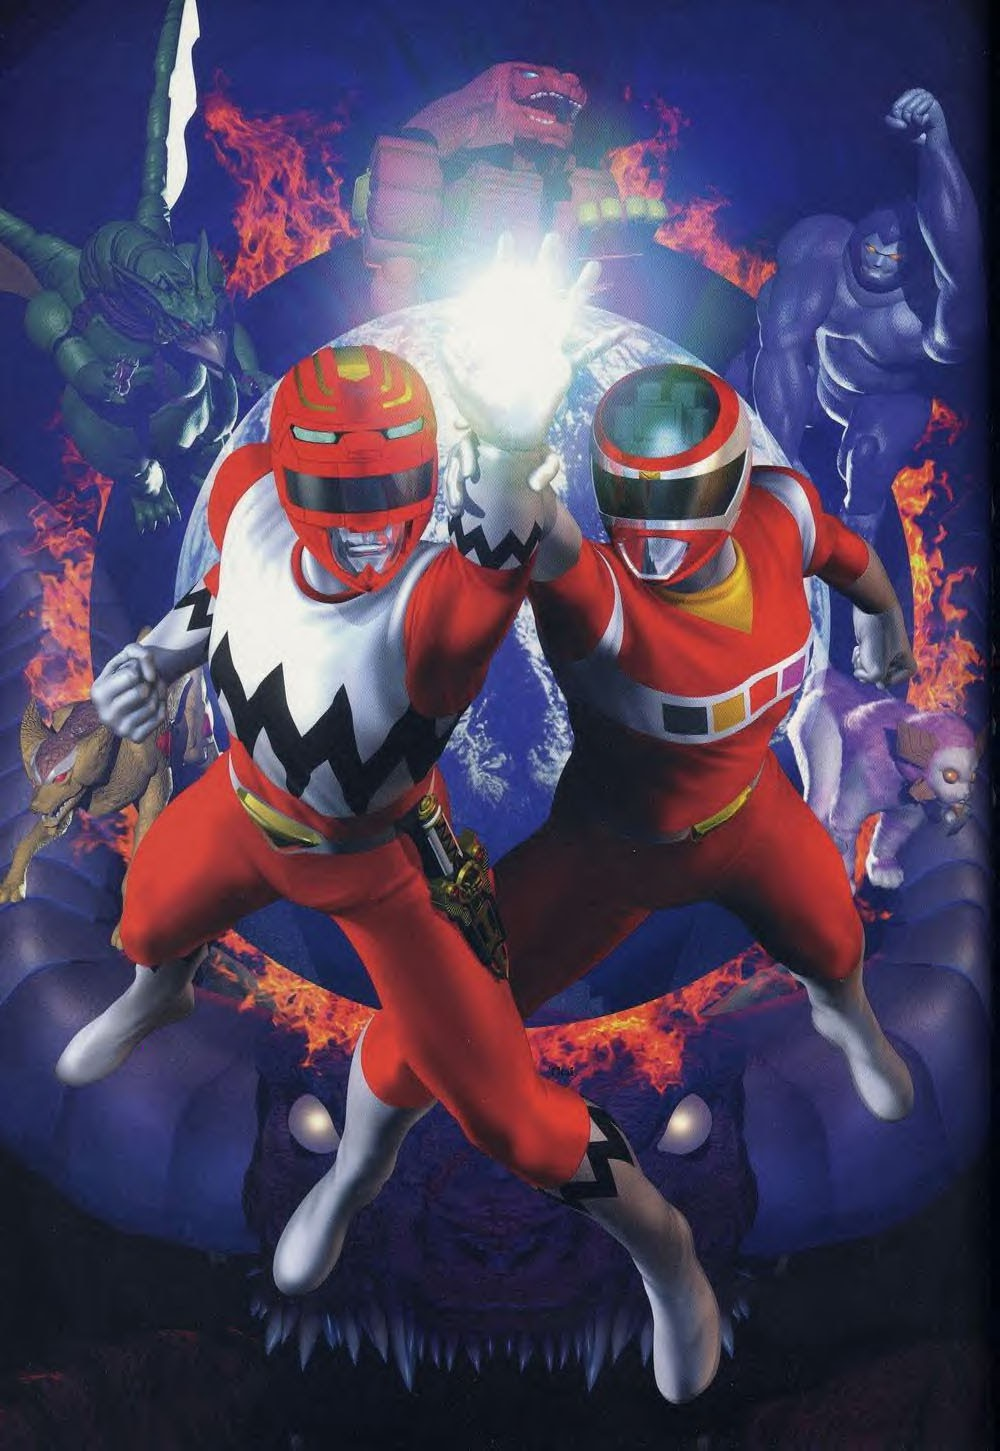 Seijuu Sentai Gingaman VS Megaranger - Siêu Nhân Gingaman VS Megaranger /VietSub